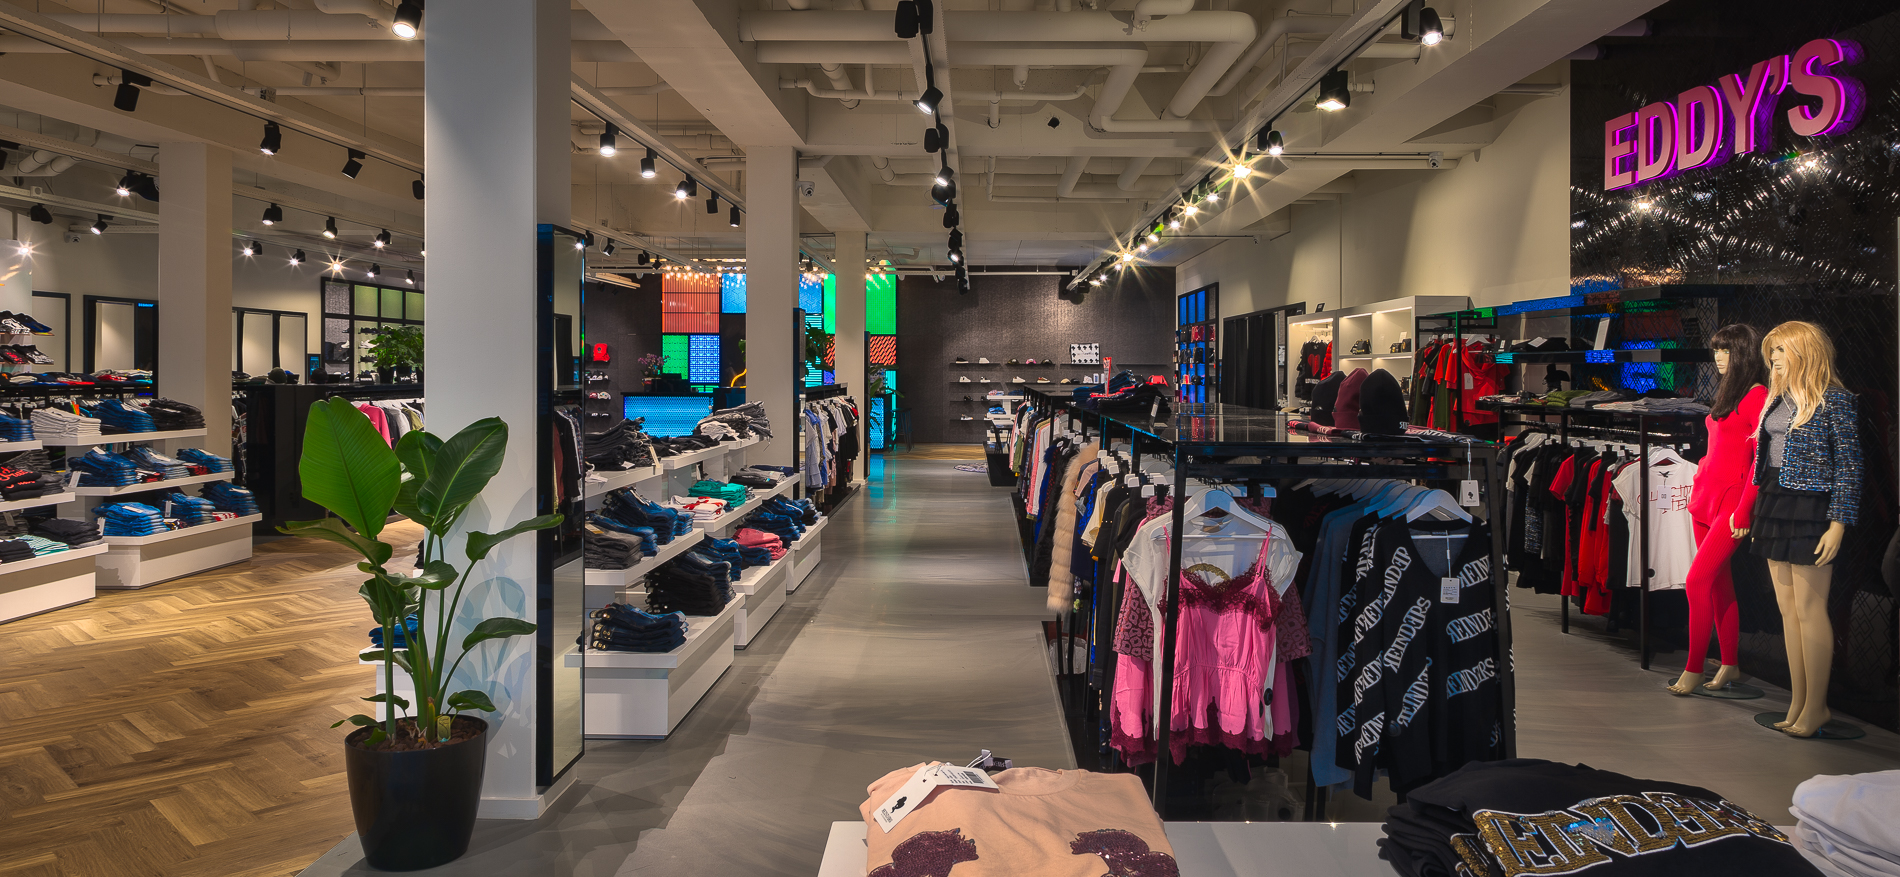 👌 NR 1 Einmalige Ladeneinrichtung Mode | Projekt: Eddy\'s Fashion